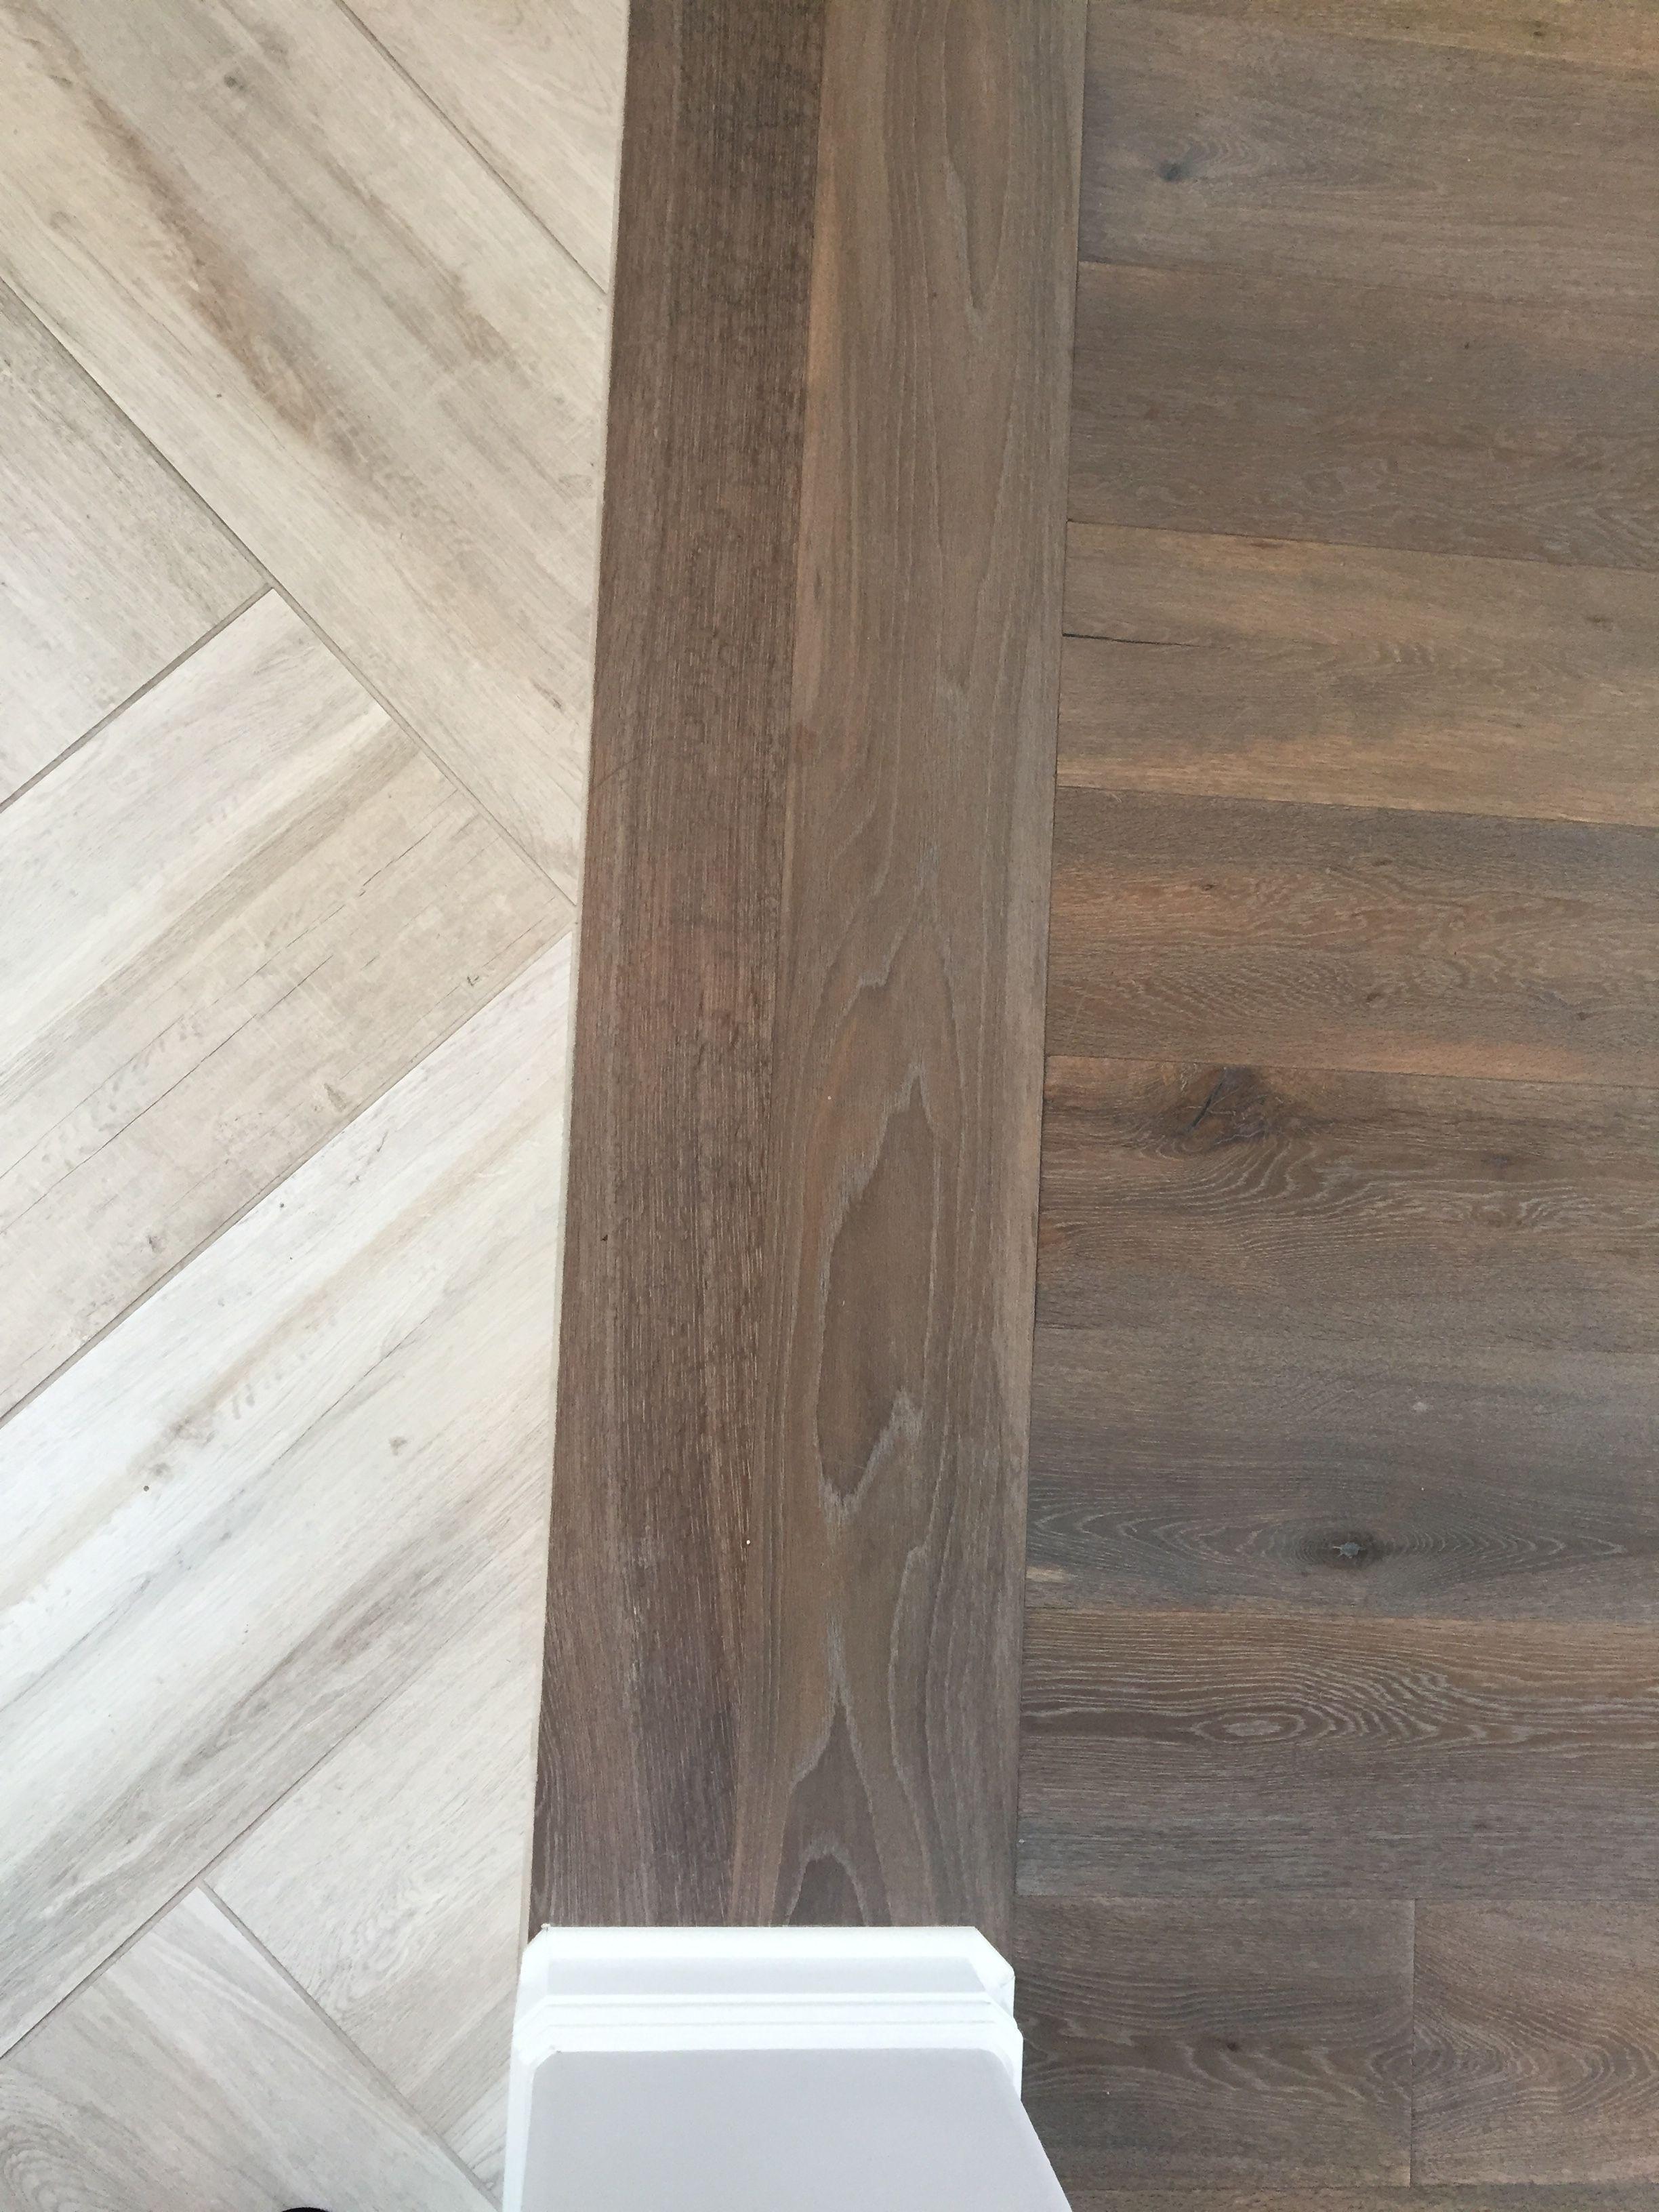 is laminate hardwood flooring good of faux wood laminate countertops crayonroom com throughout faux wood laminate countertops lovely faux wood tile grey wood look tile bathroom od look tile